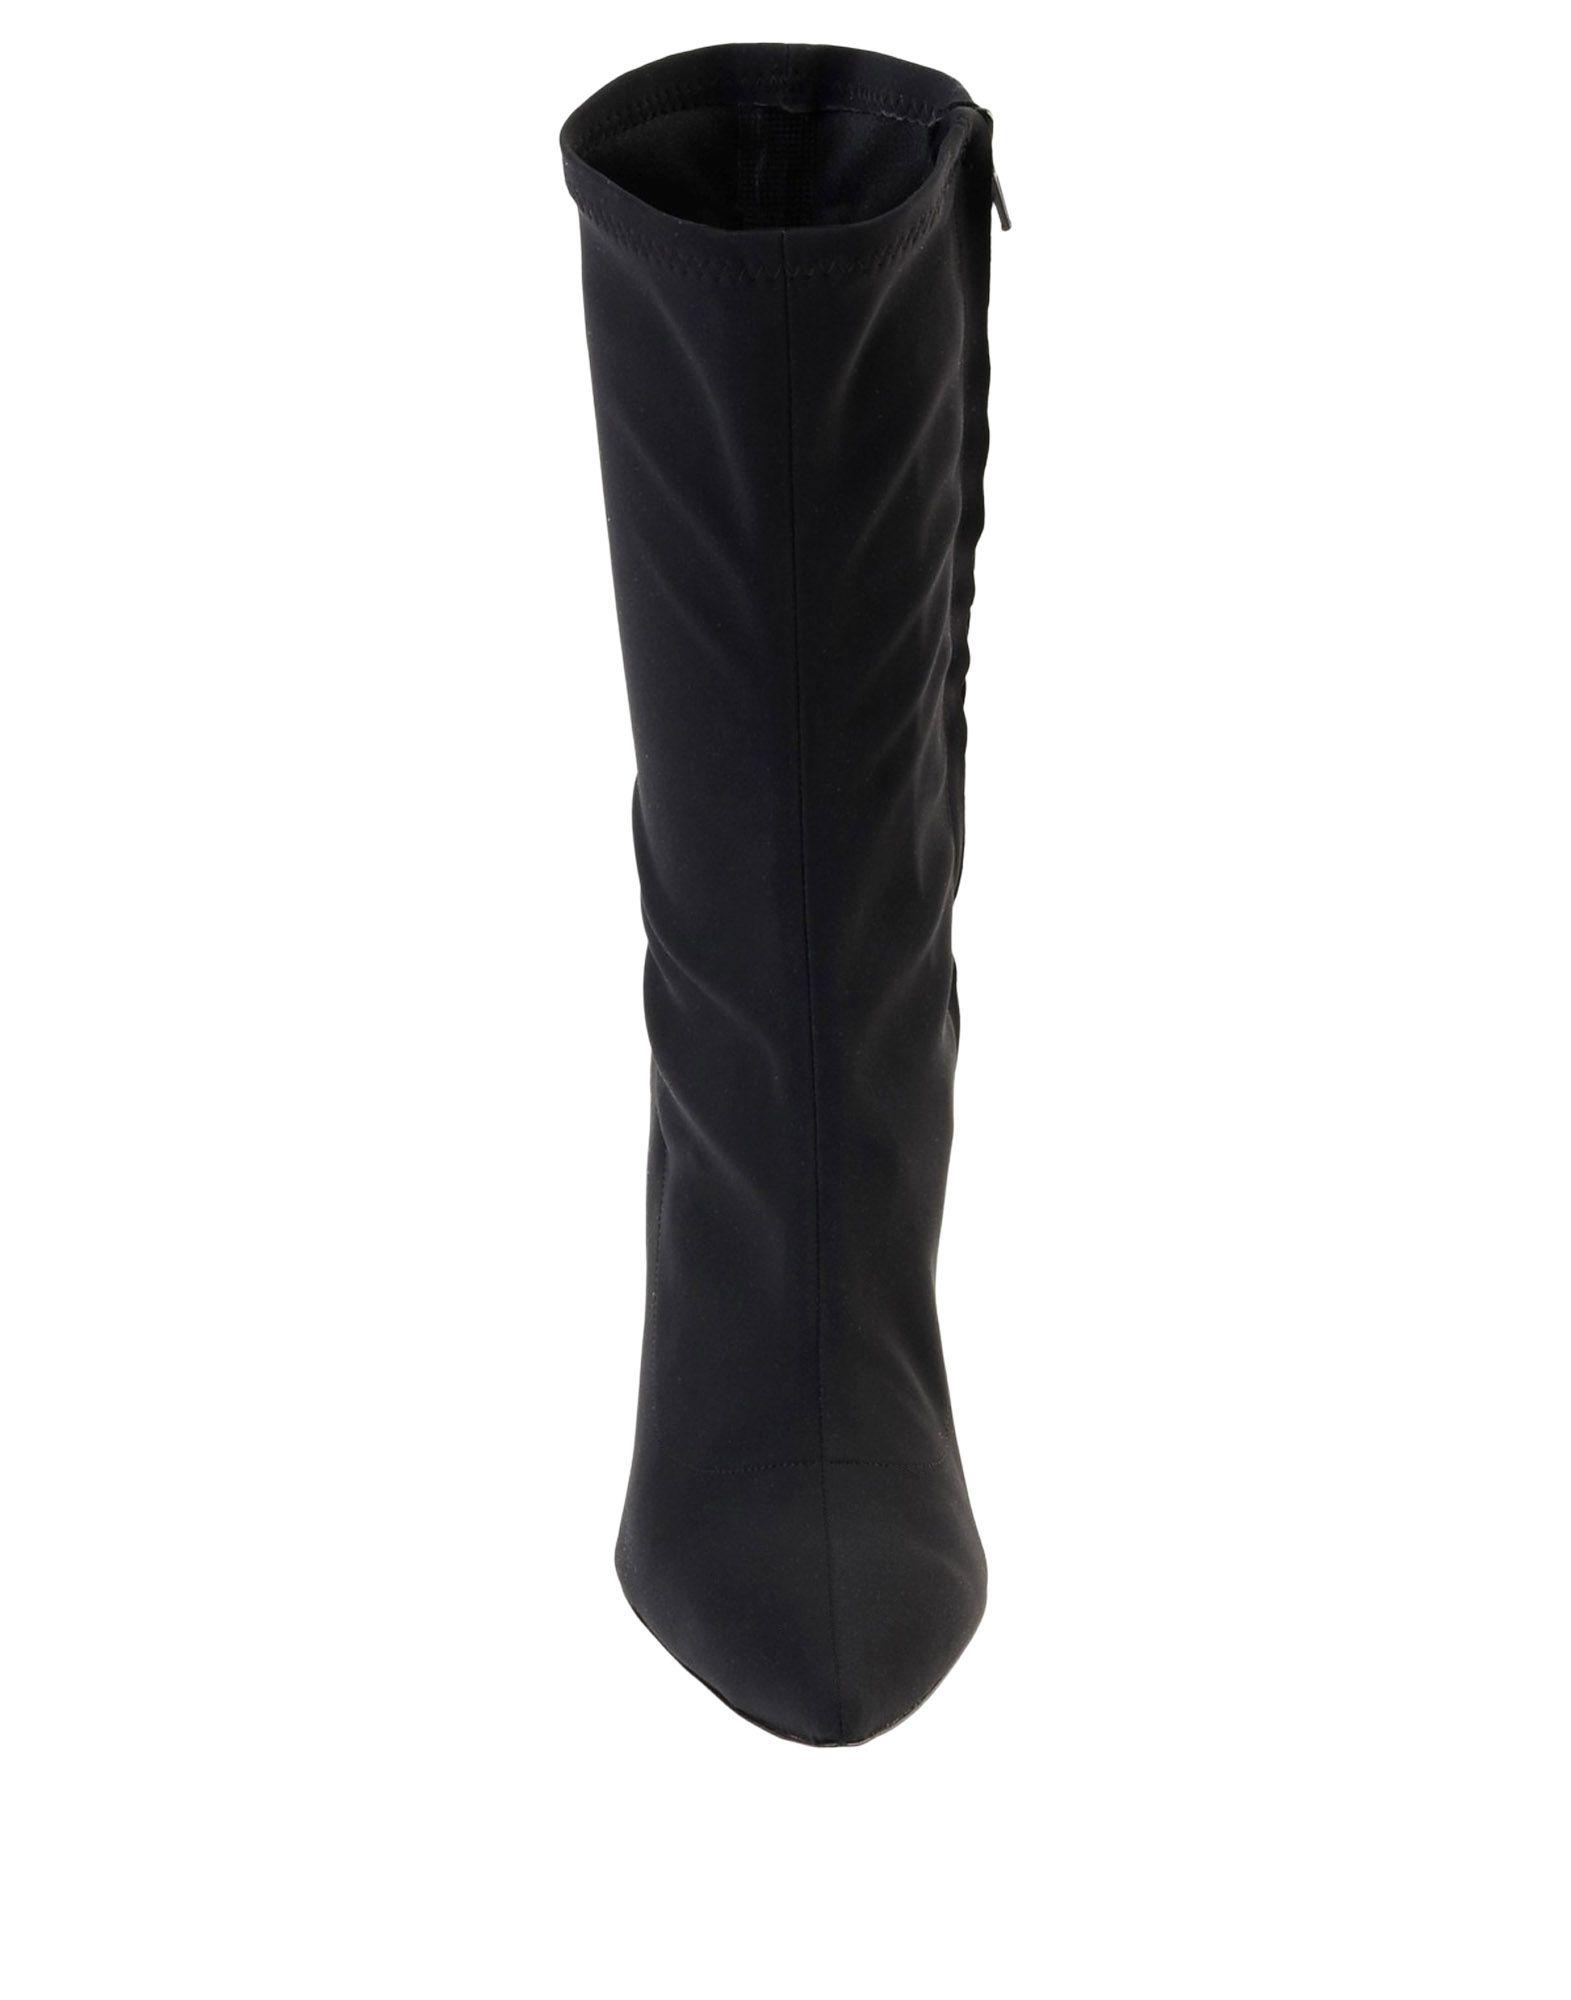 Stilvolle Damen billige Schuhe Jolie By Edward Spiers Stiefelette Damen Stilvolle  11535516PG cbb3e8